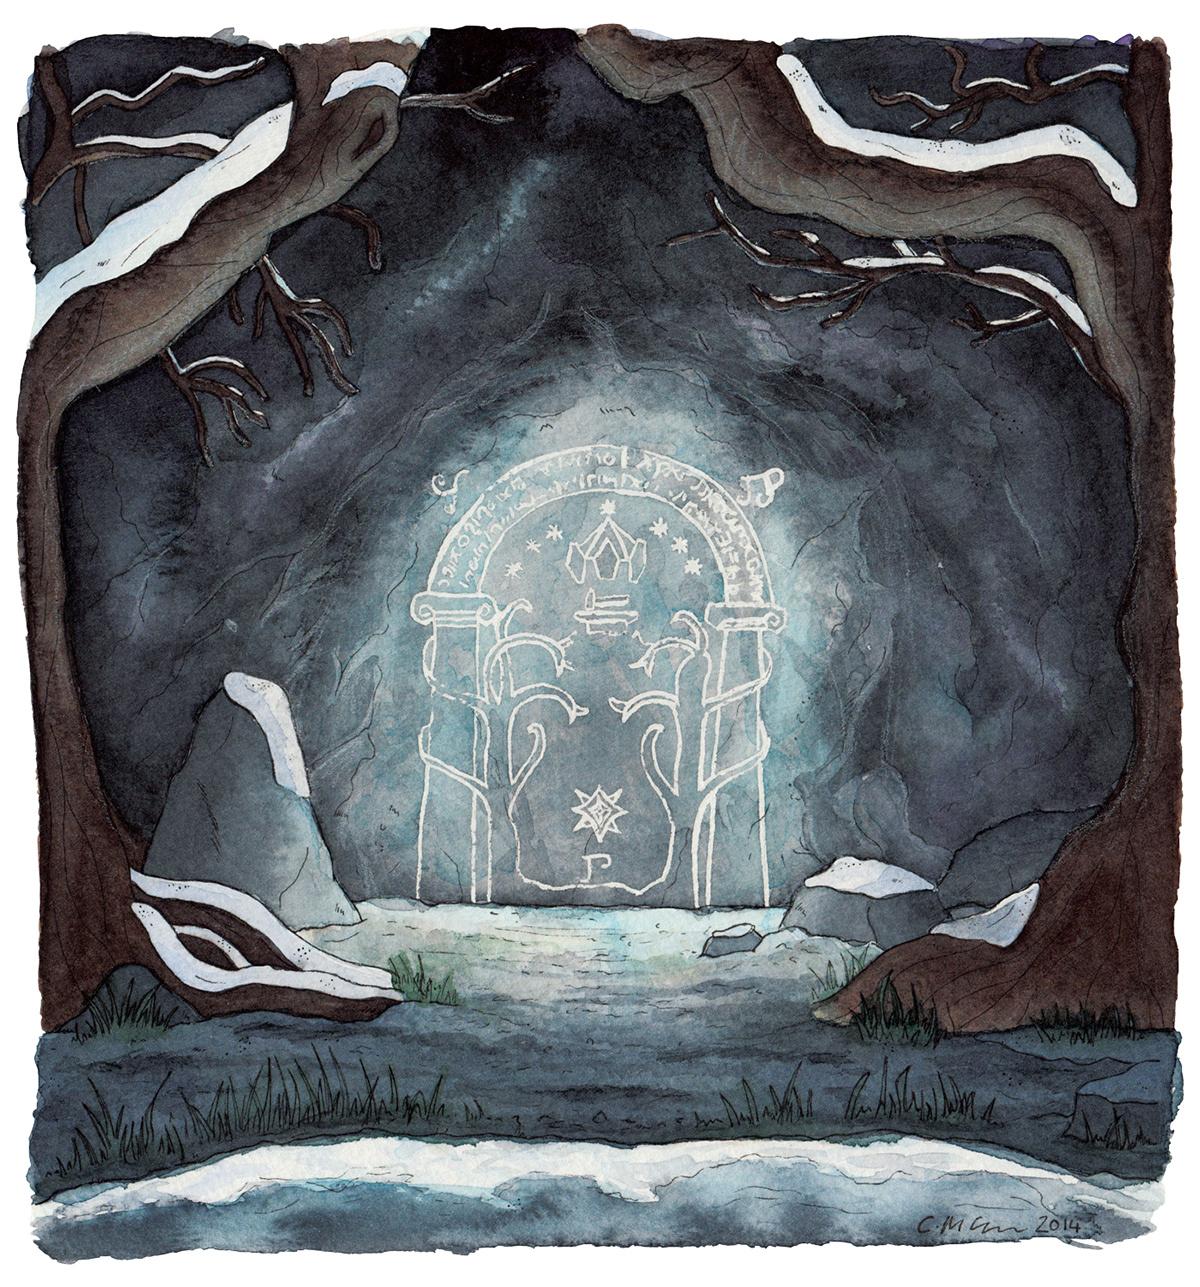 rings lord Christmas winter Hobbiton Rivendell moria j r.r tolkien literature fantasy